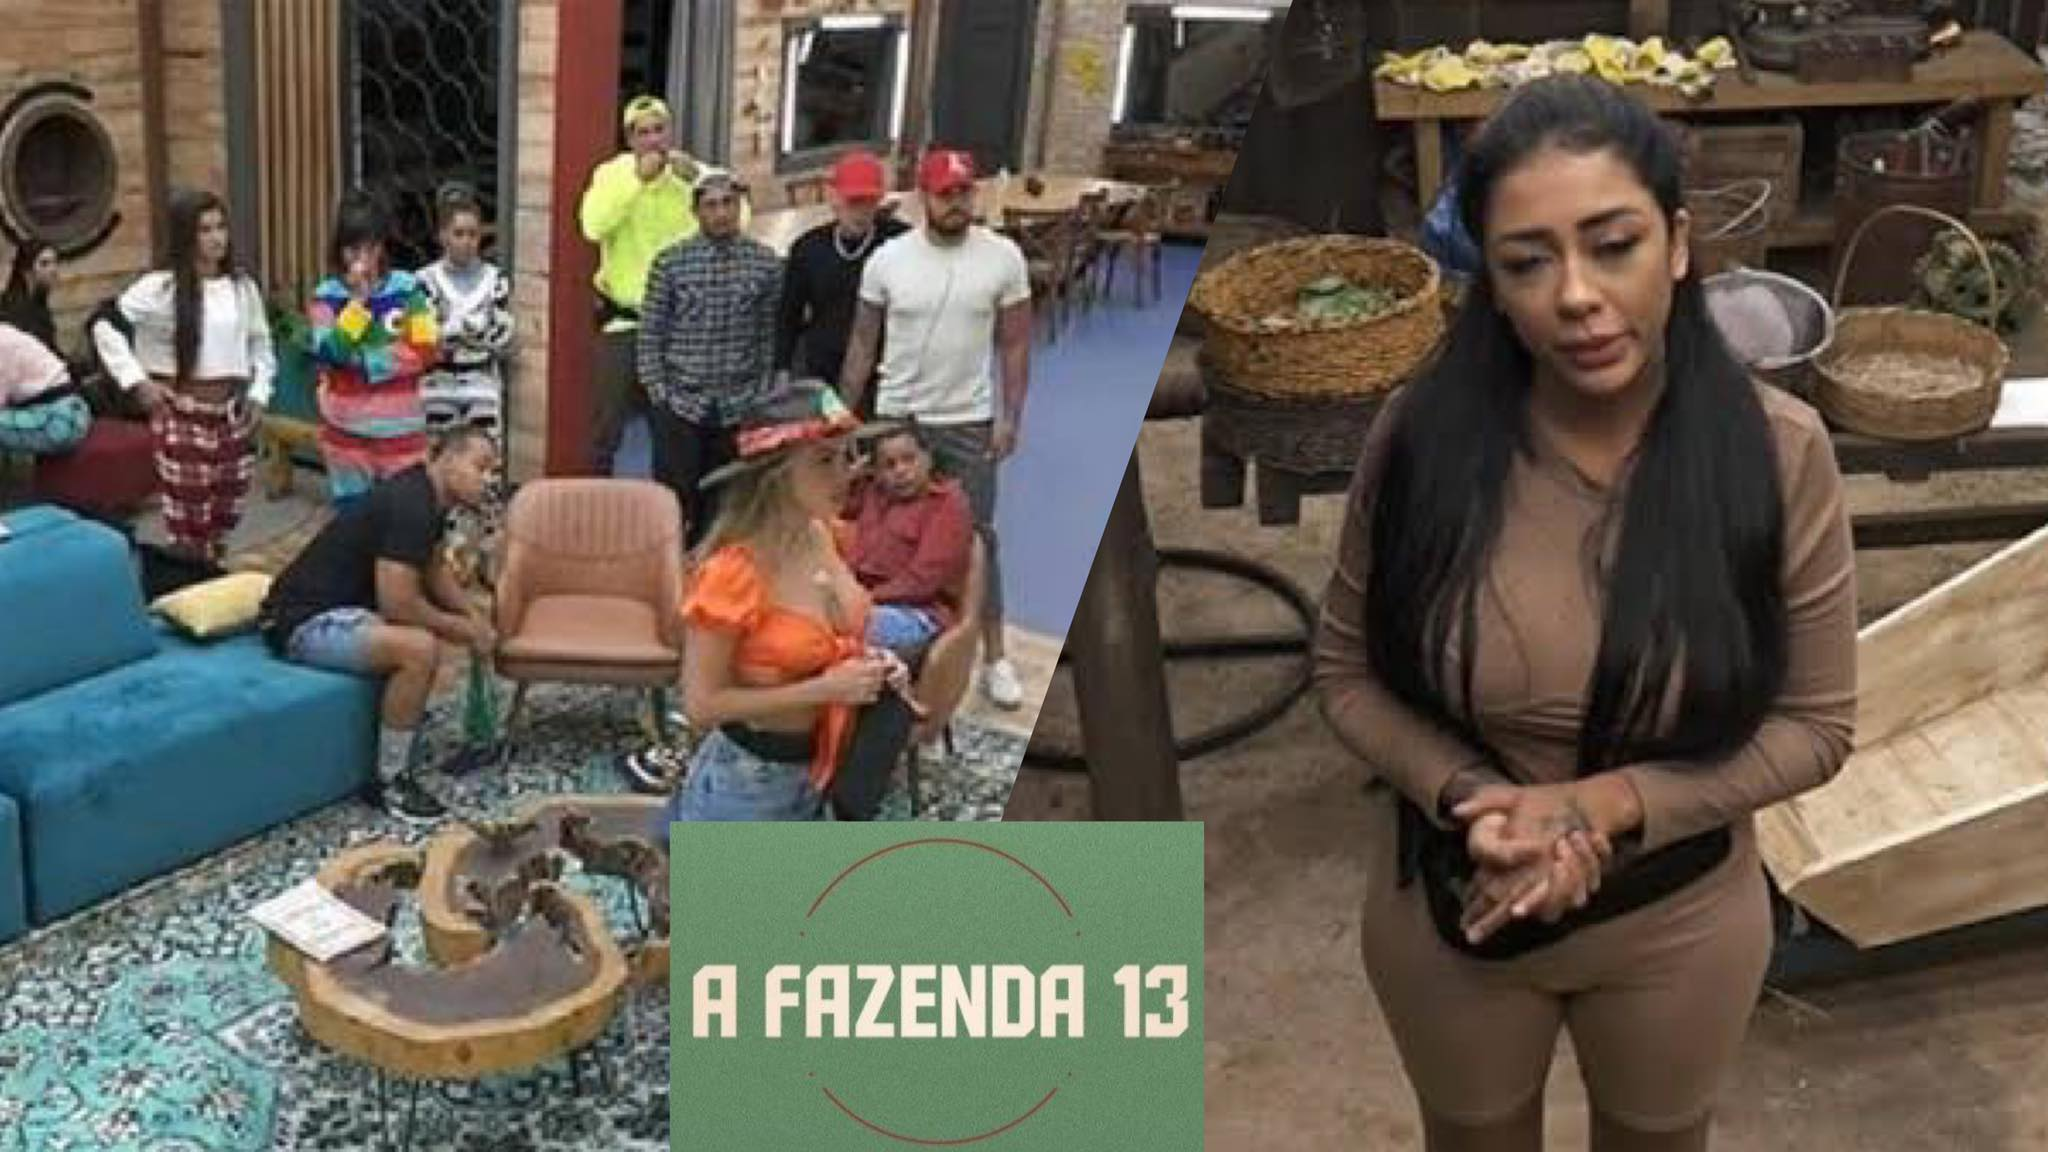 A Fazenda 2021, Record TV